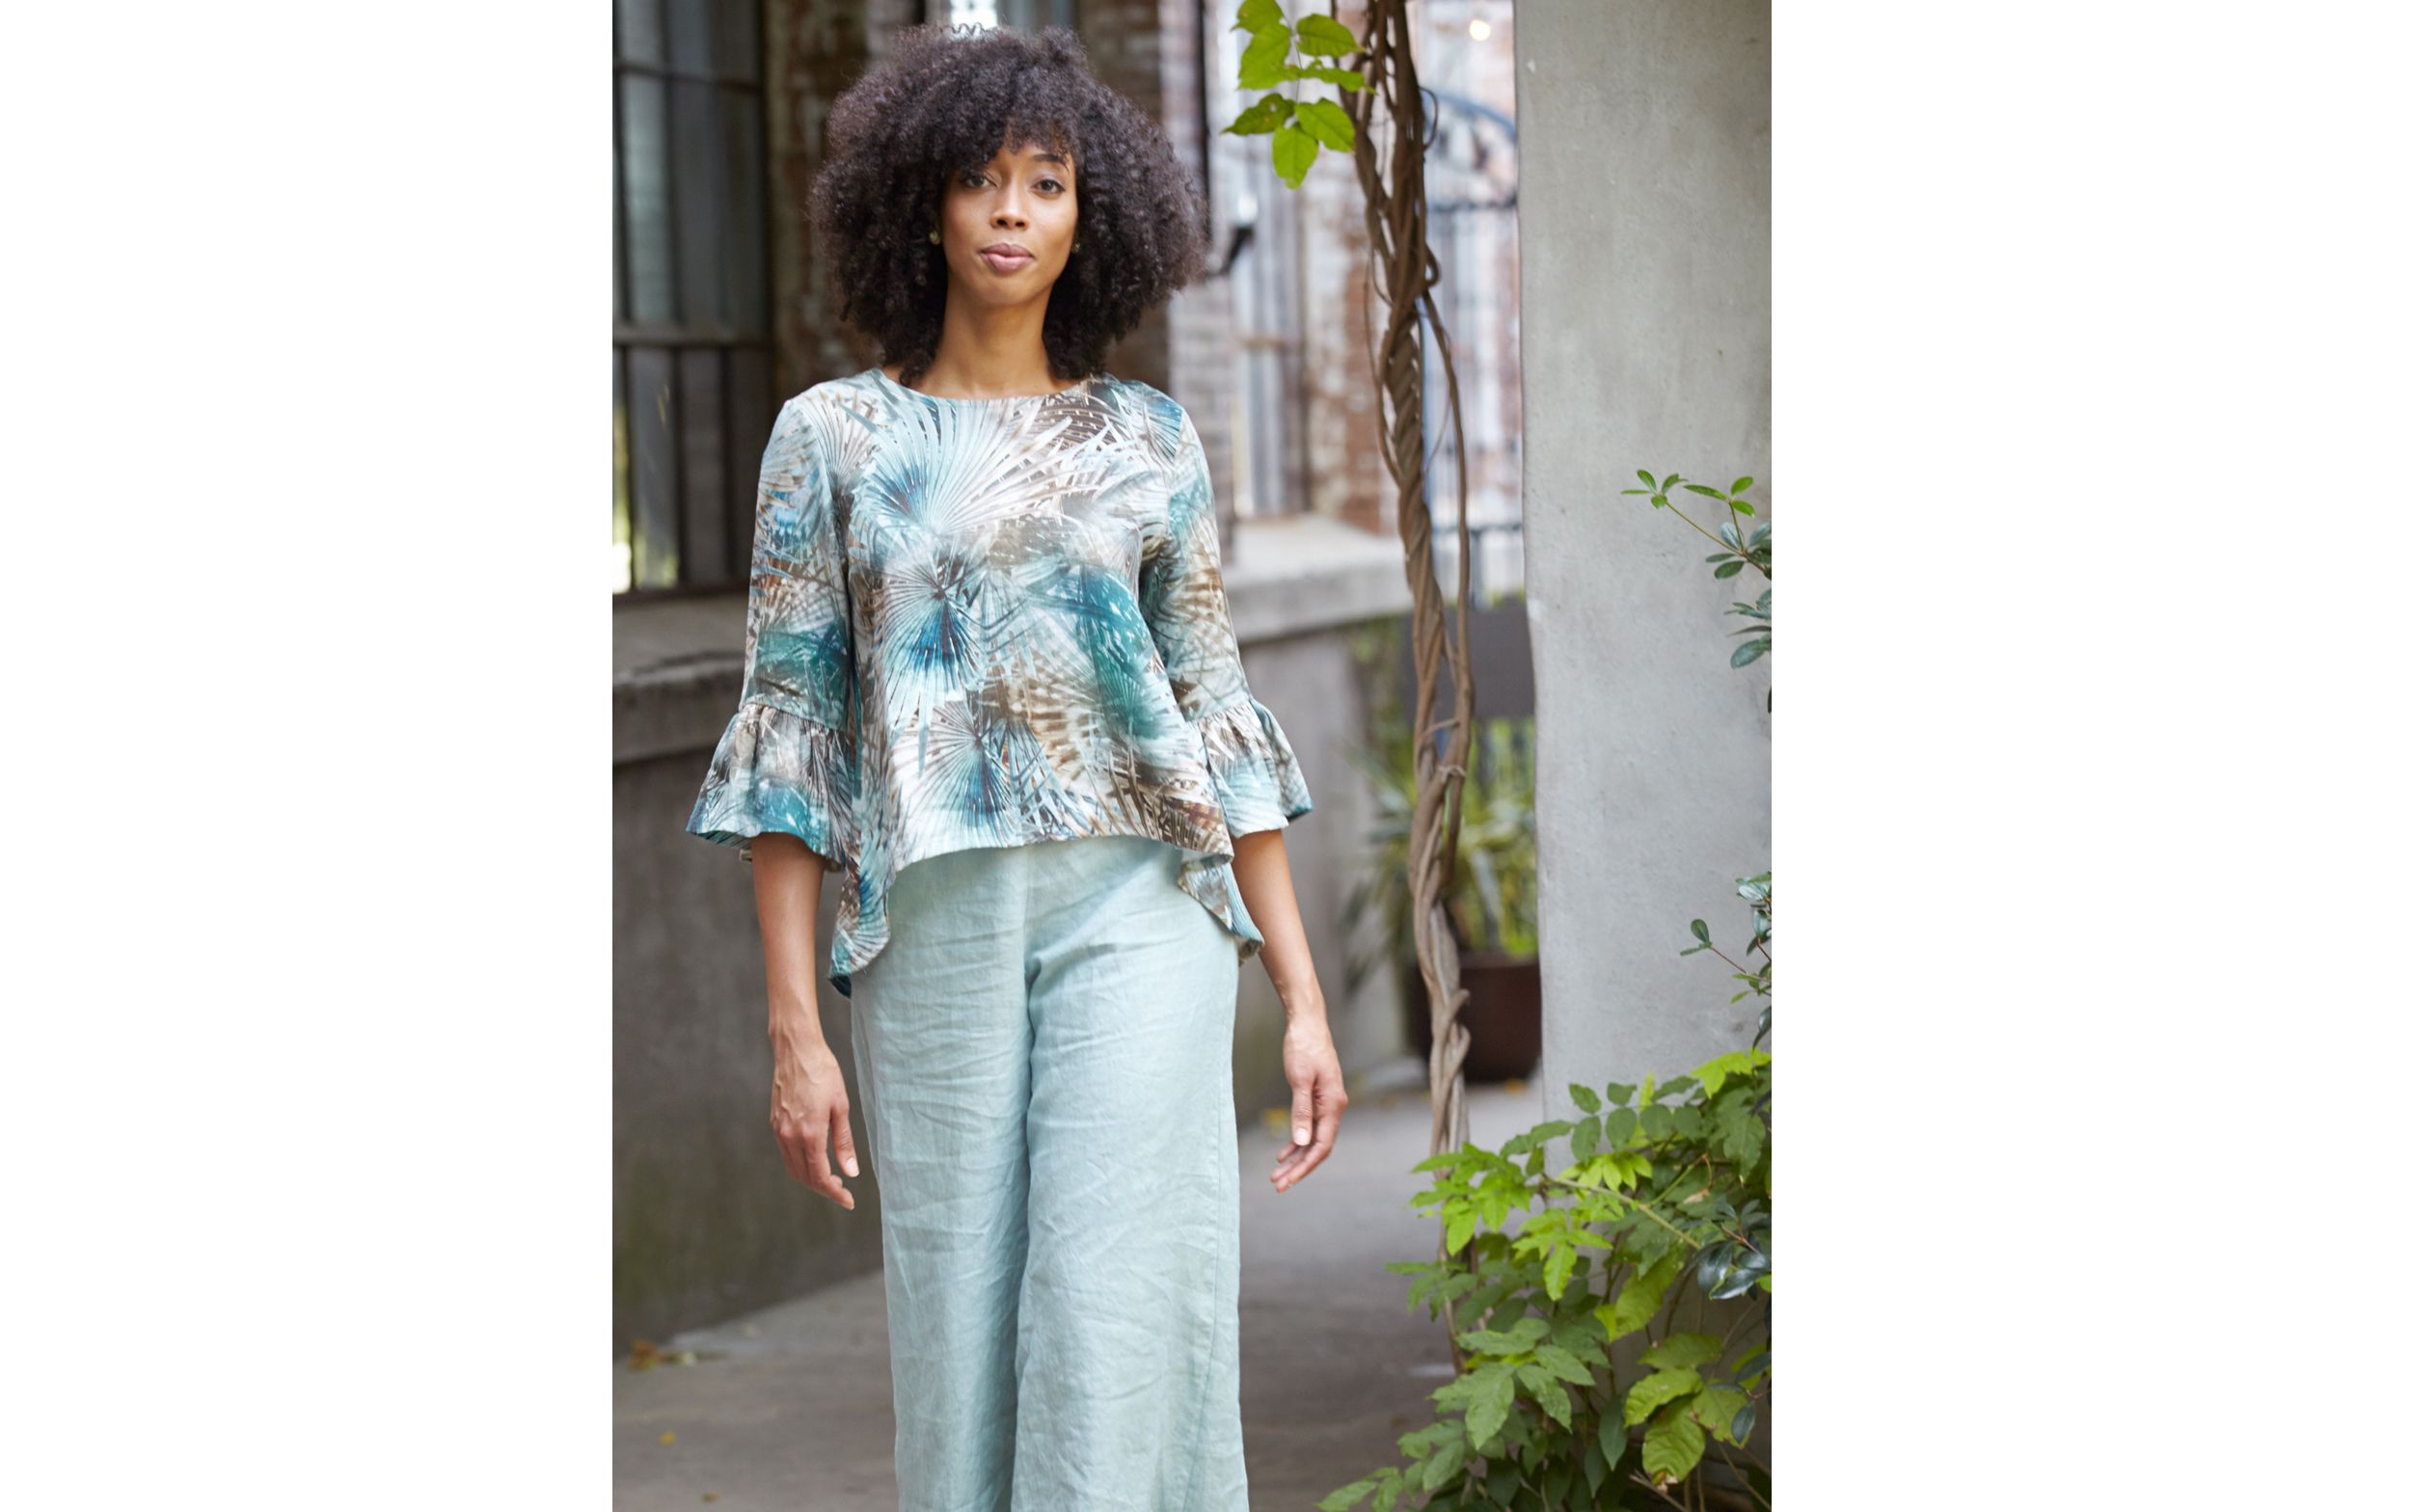 Fran Shirt in Palma Italian Linen,Long Full Pant in Taormina Cross Dyed Linen